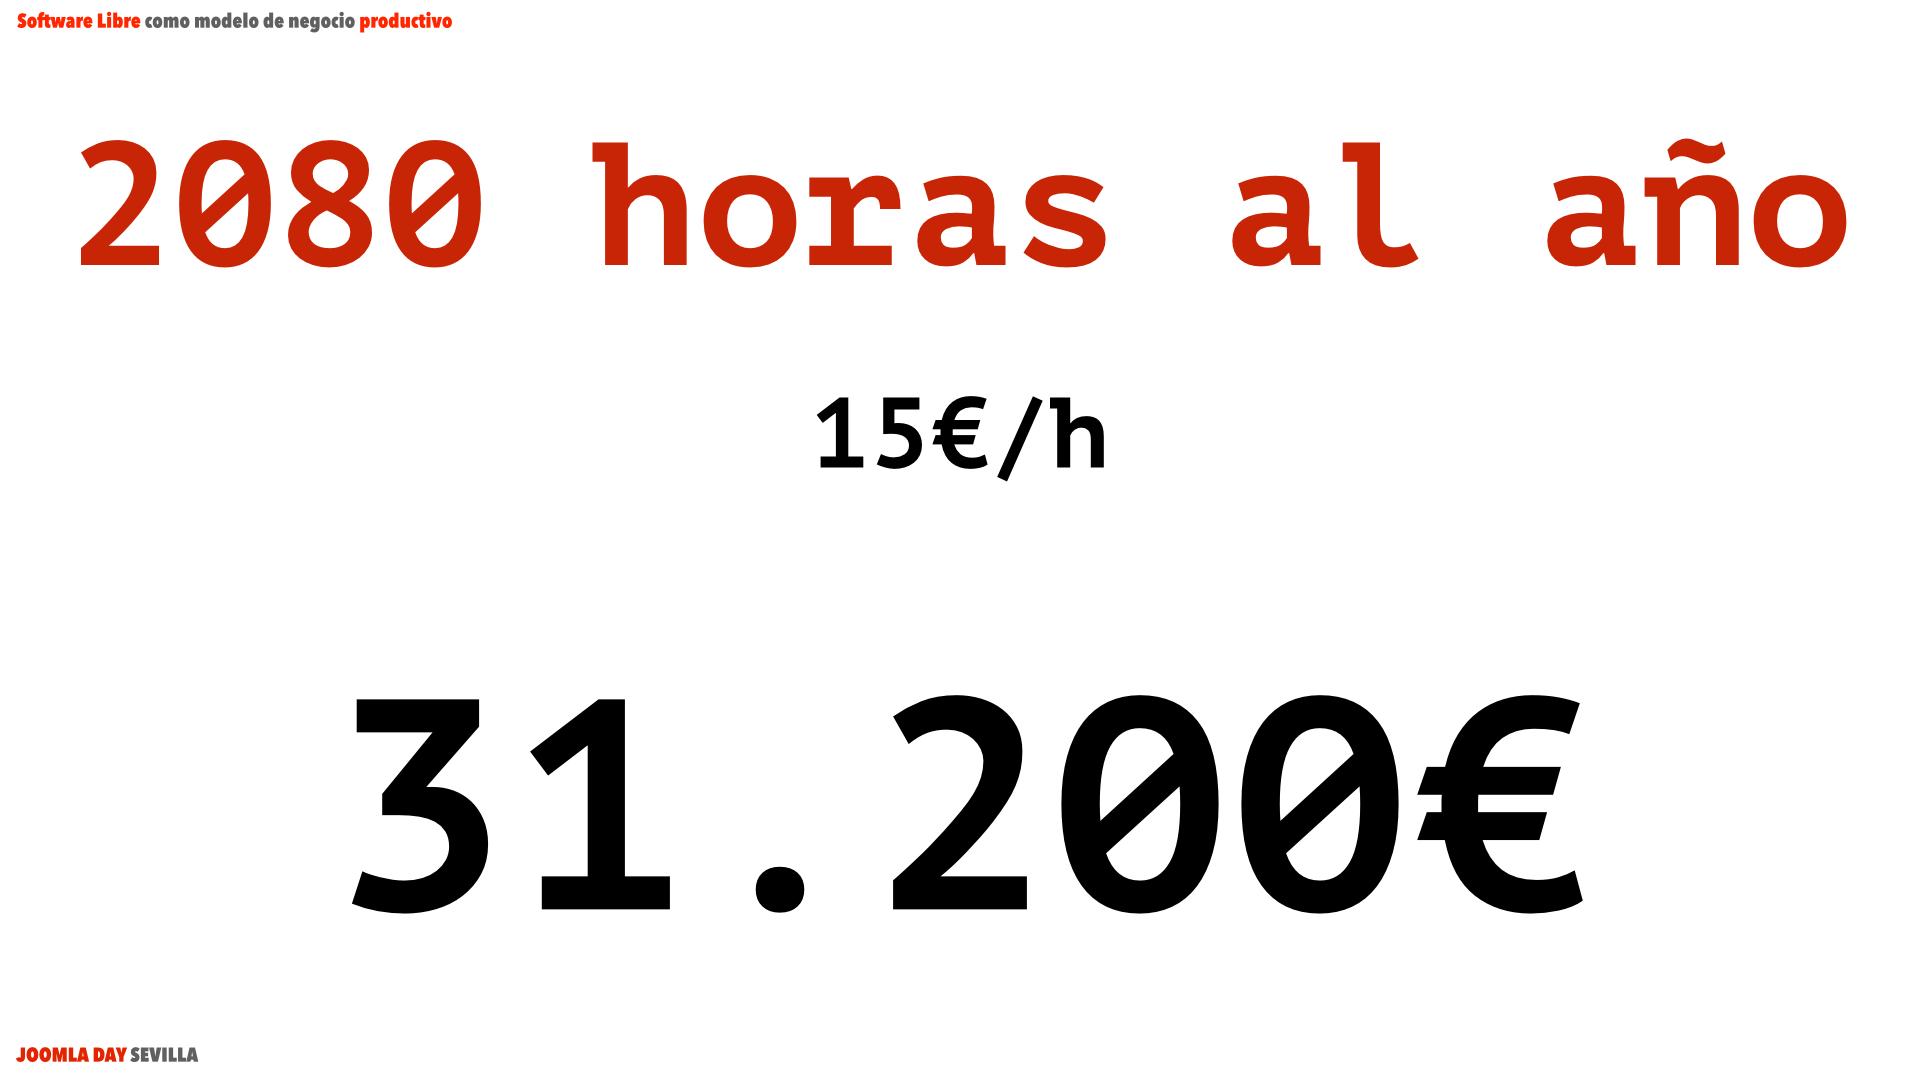 SL.079